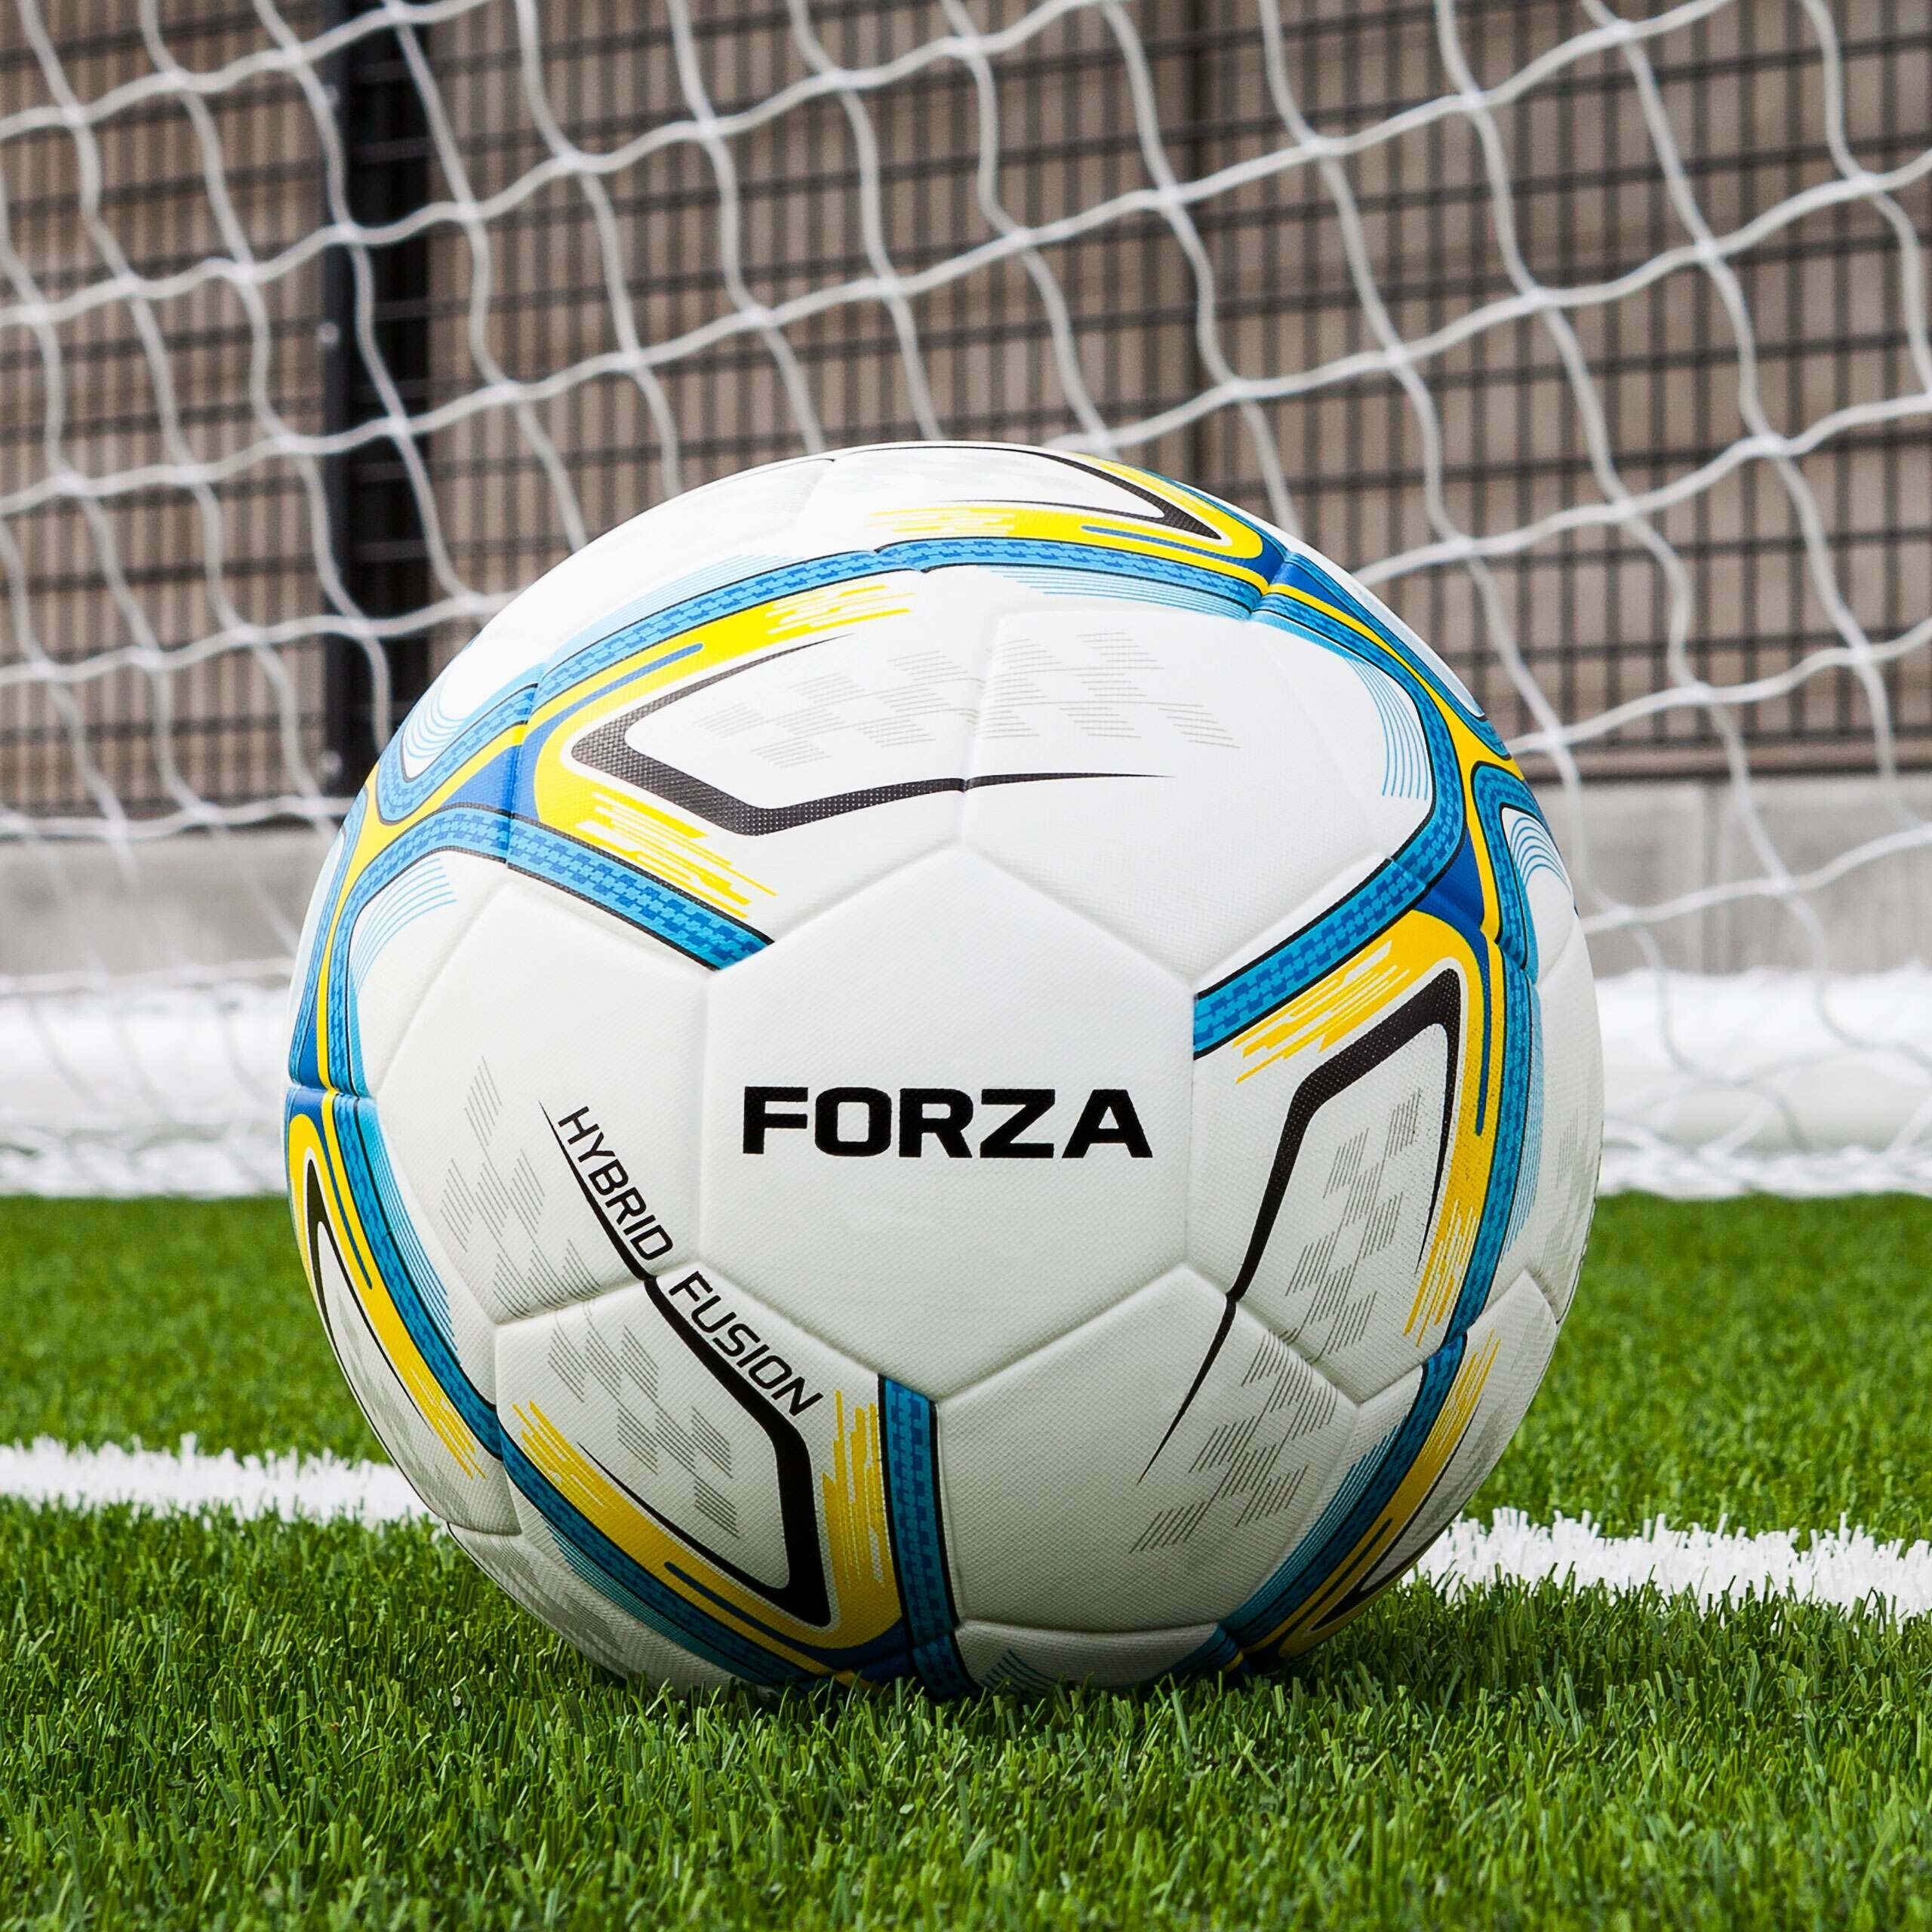 7b51c430f3b11 Top 10 Punto Medio Noticias | Soccer Ball